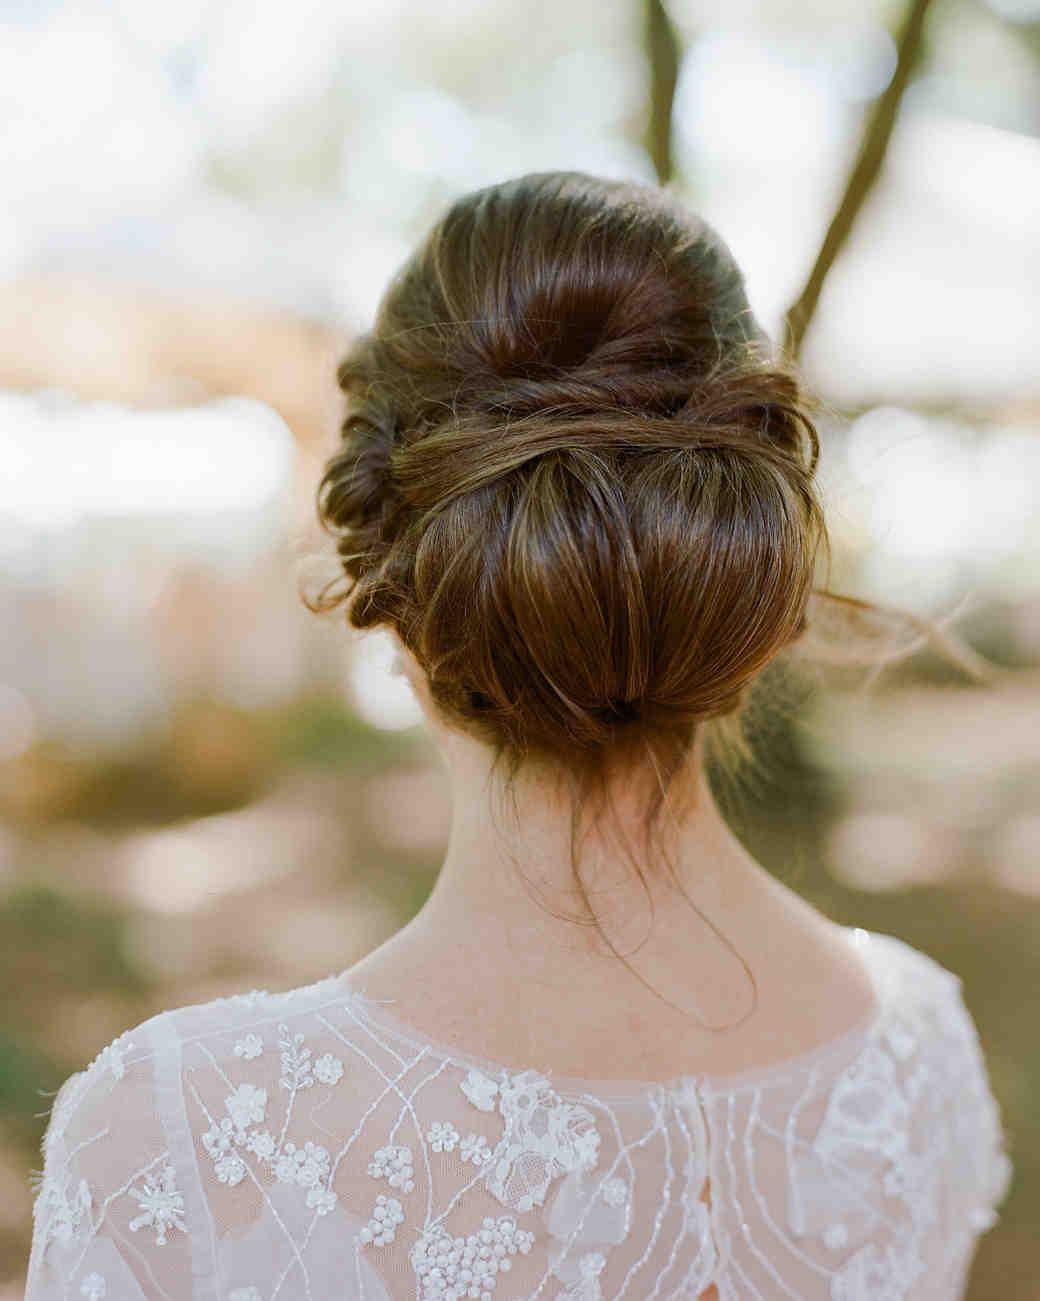 Long Hairstyles For Weddings  37 Pretty Wedding Hairstyles for Brides with Long Hair